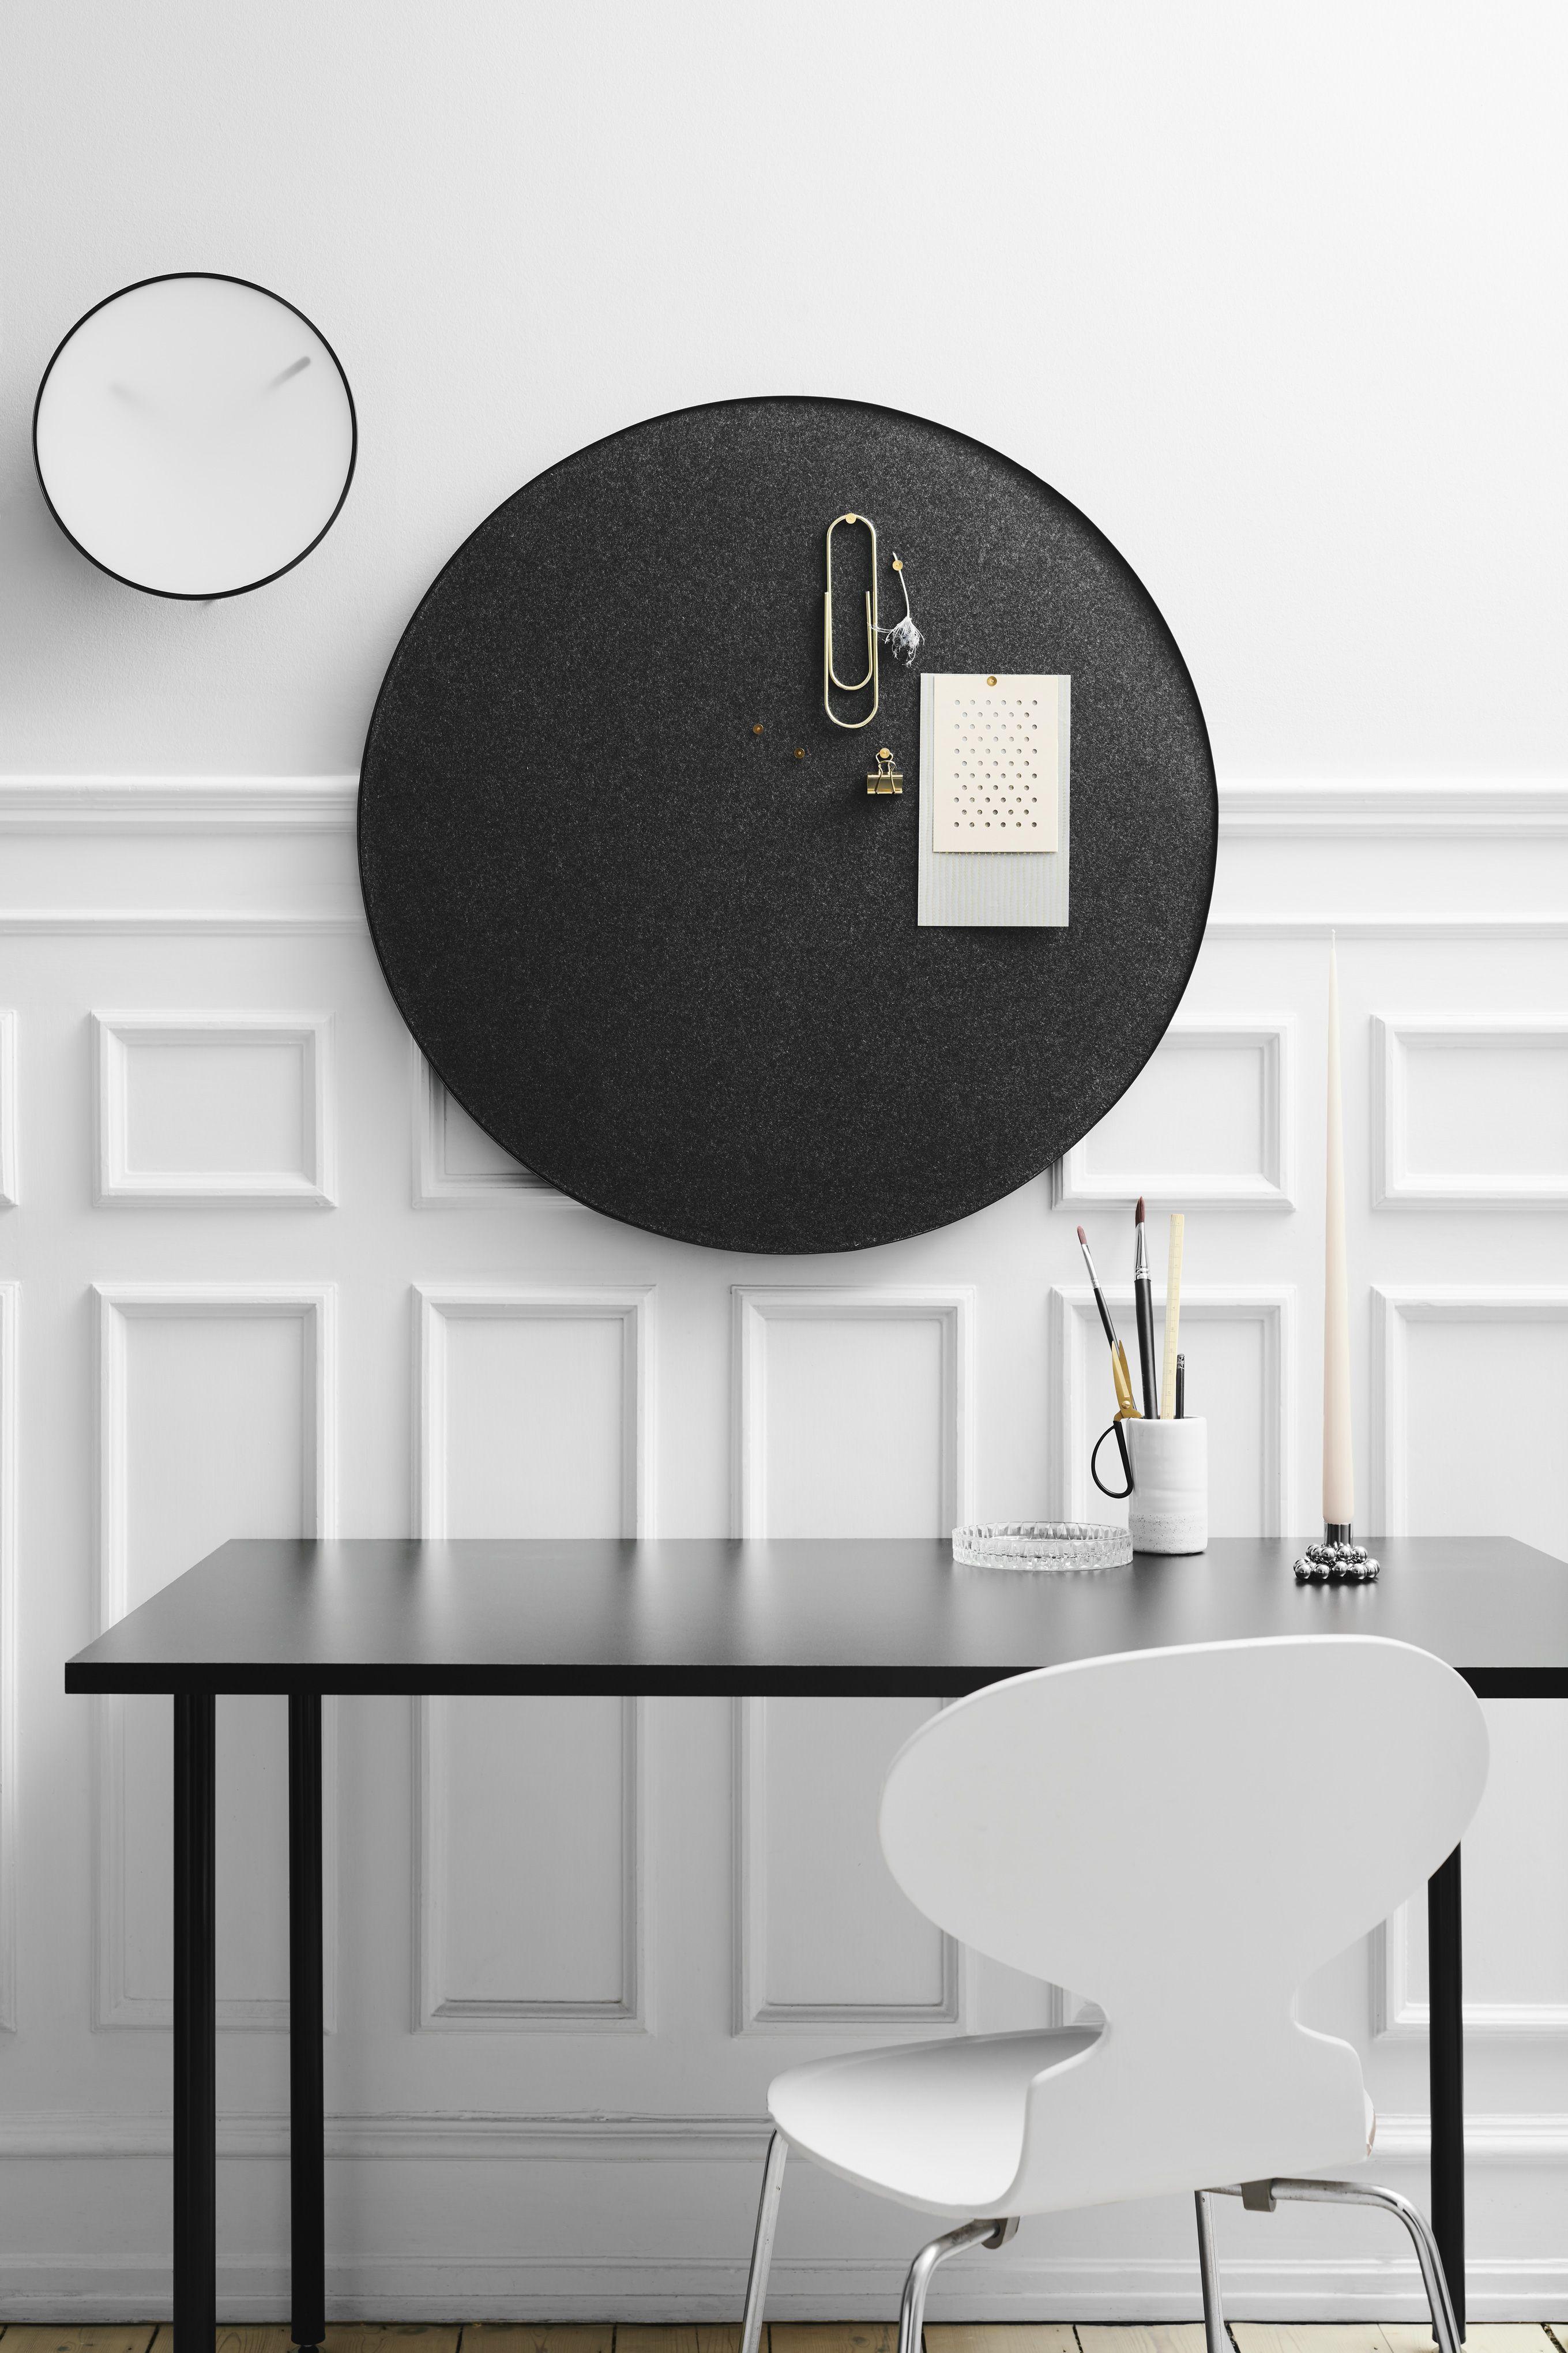 Momentt and Retell   Retelling, Architect house, Round mirror bathroom